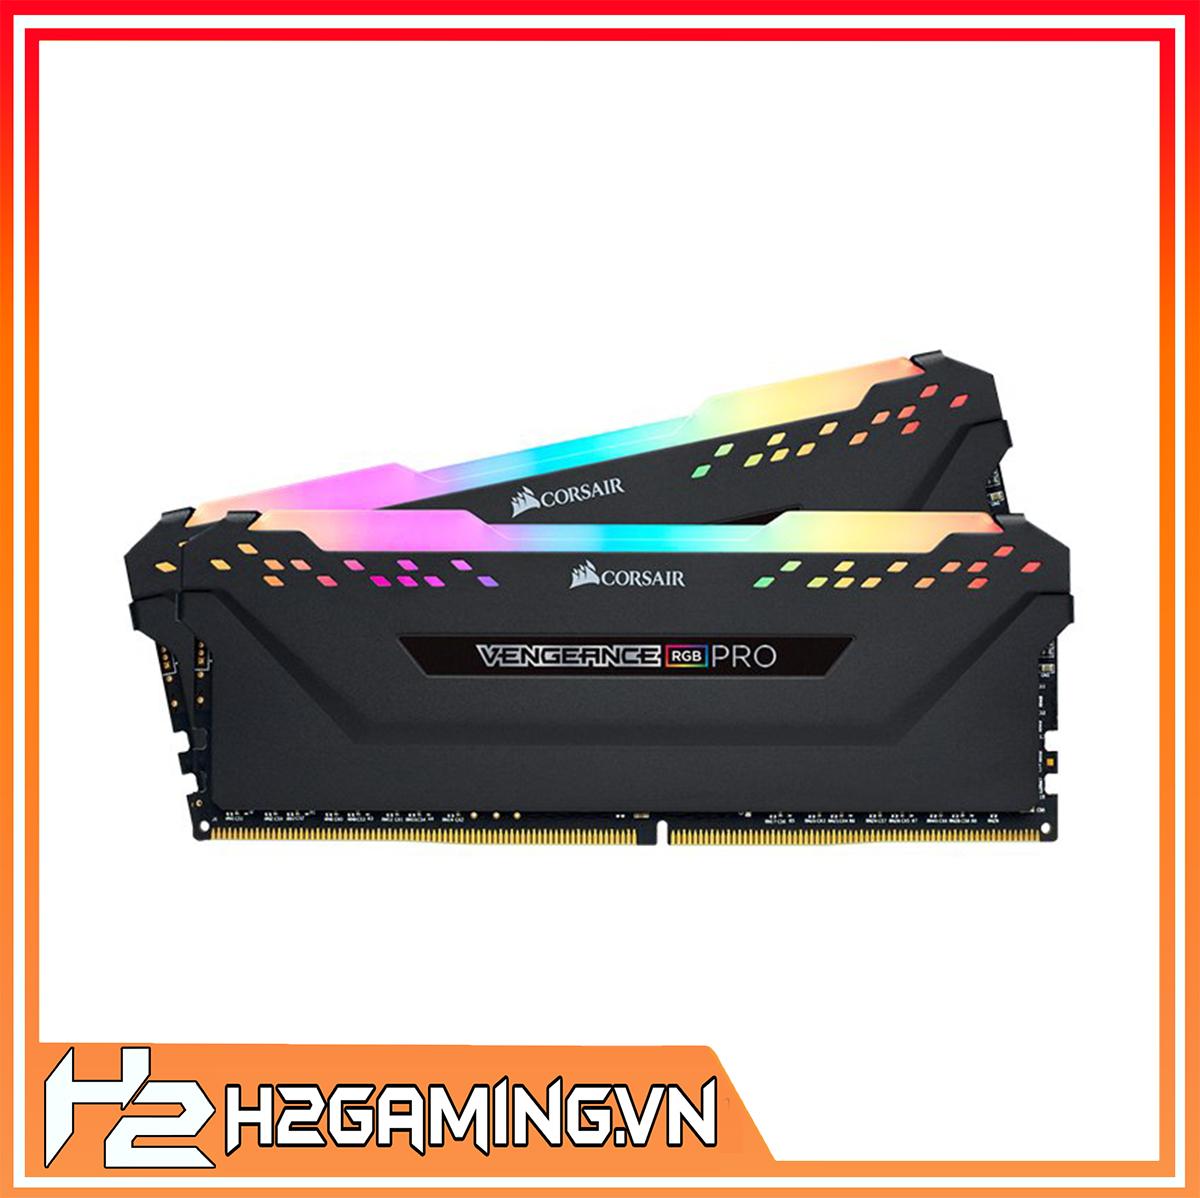 Ram_Desktop_Corsair_Vengeance_PRO_RGB_(CMW32GX4M2E3200C16)_32GB_(2x16GB)_DDR4_3200MHz